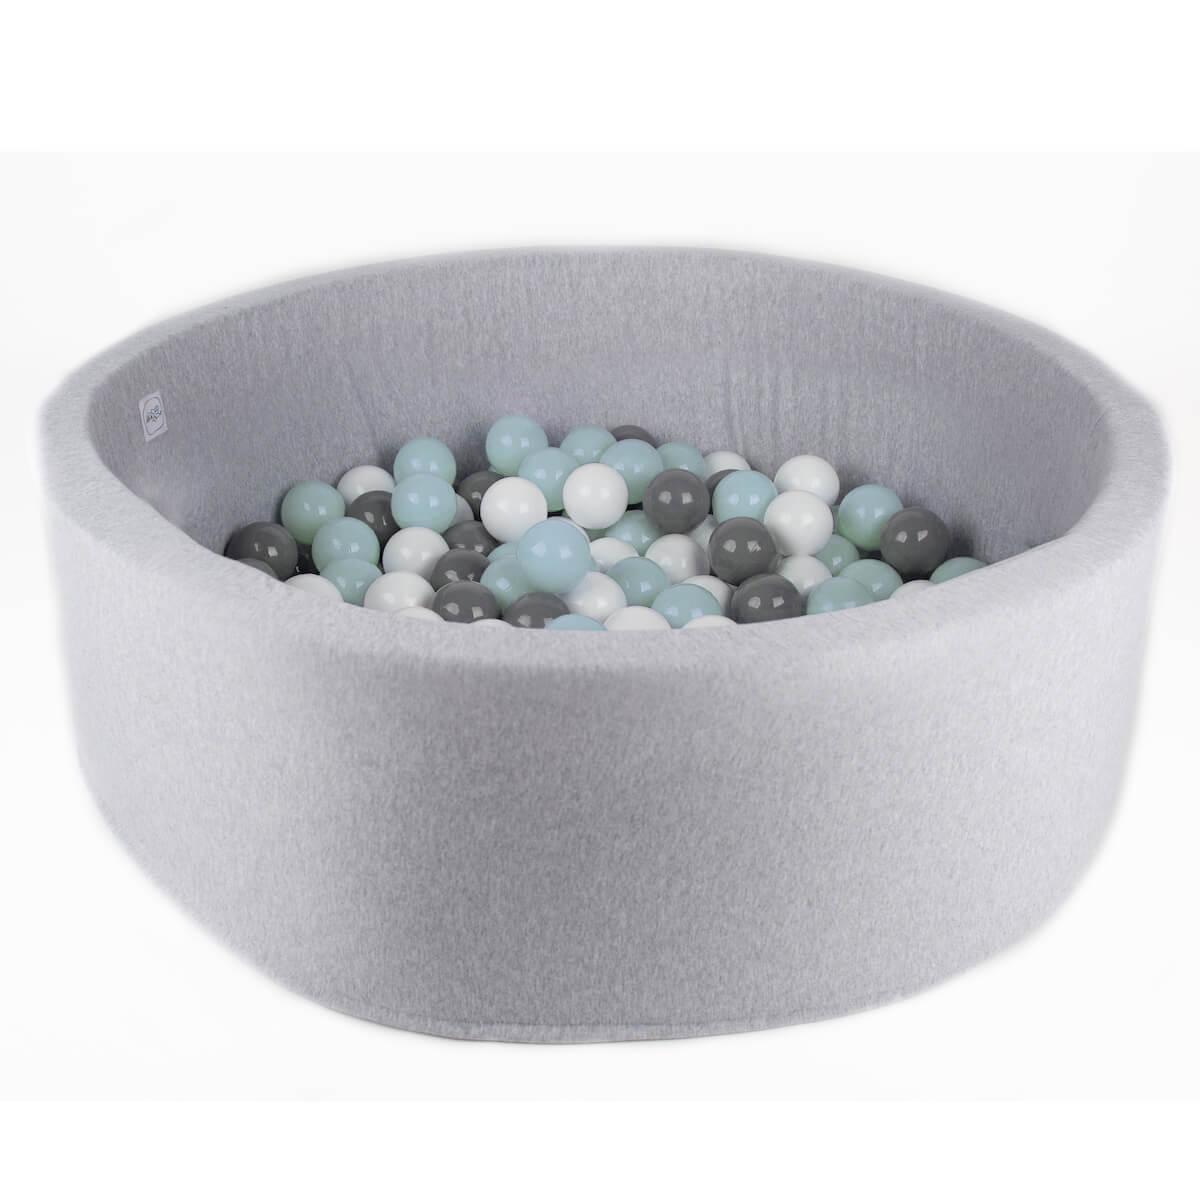 Piscine 200 boules  LIGHT GREY Minibe blanc-gris claro-mint